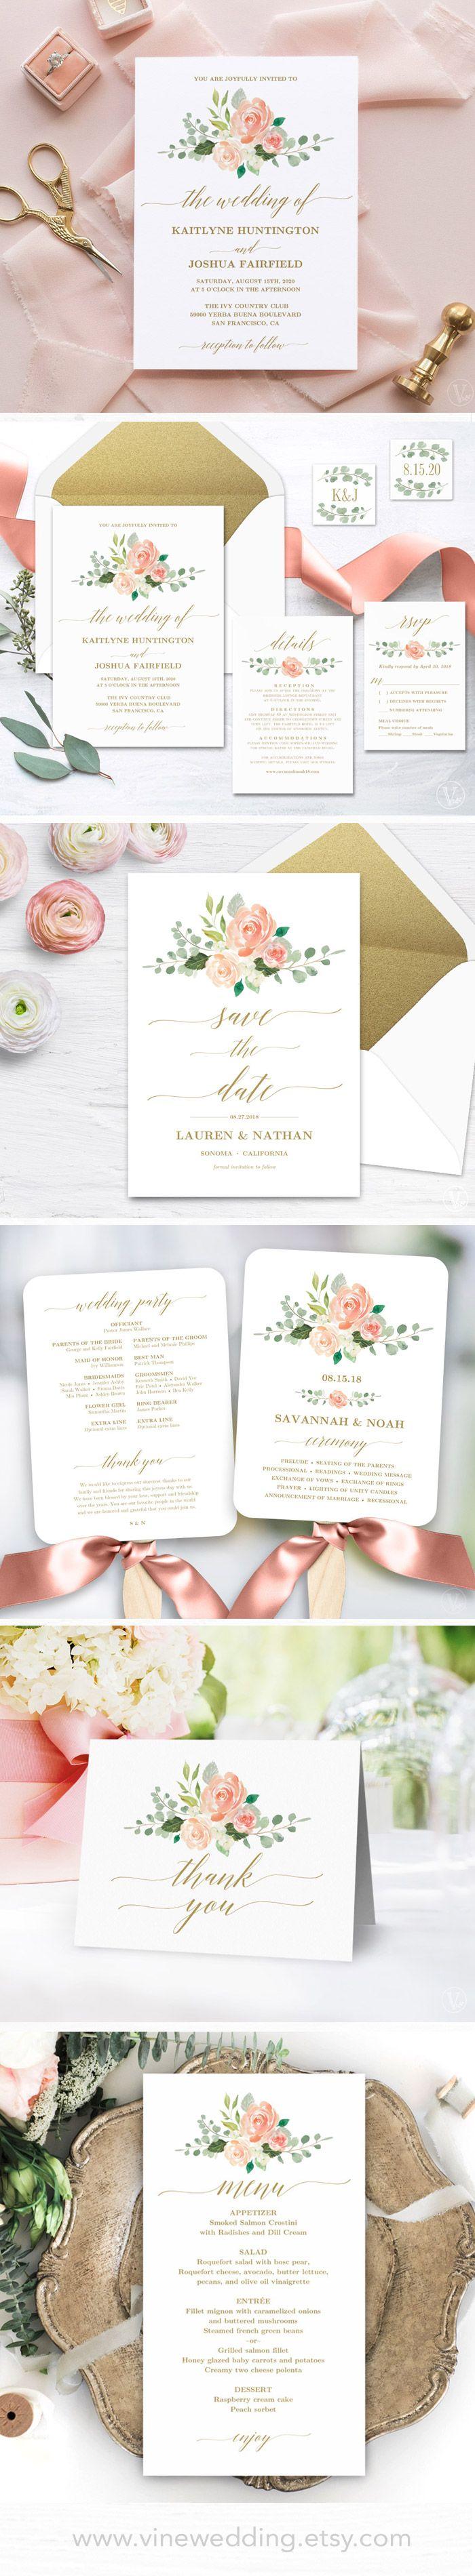 Blush peach and gold wedding invitations diy printable wedding